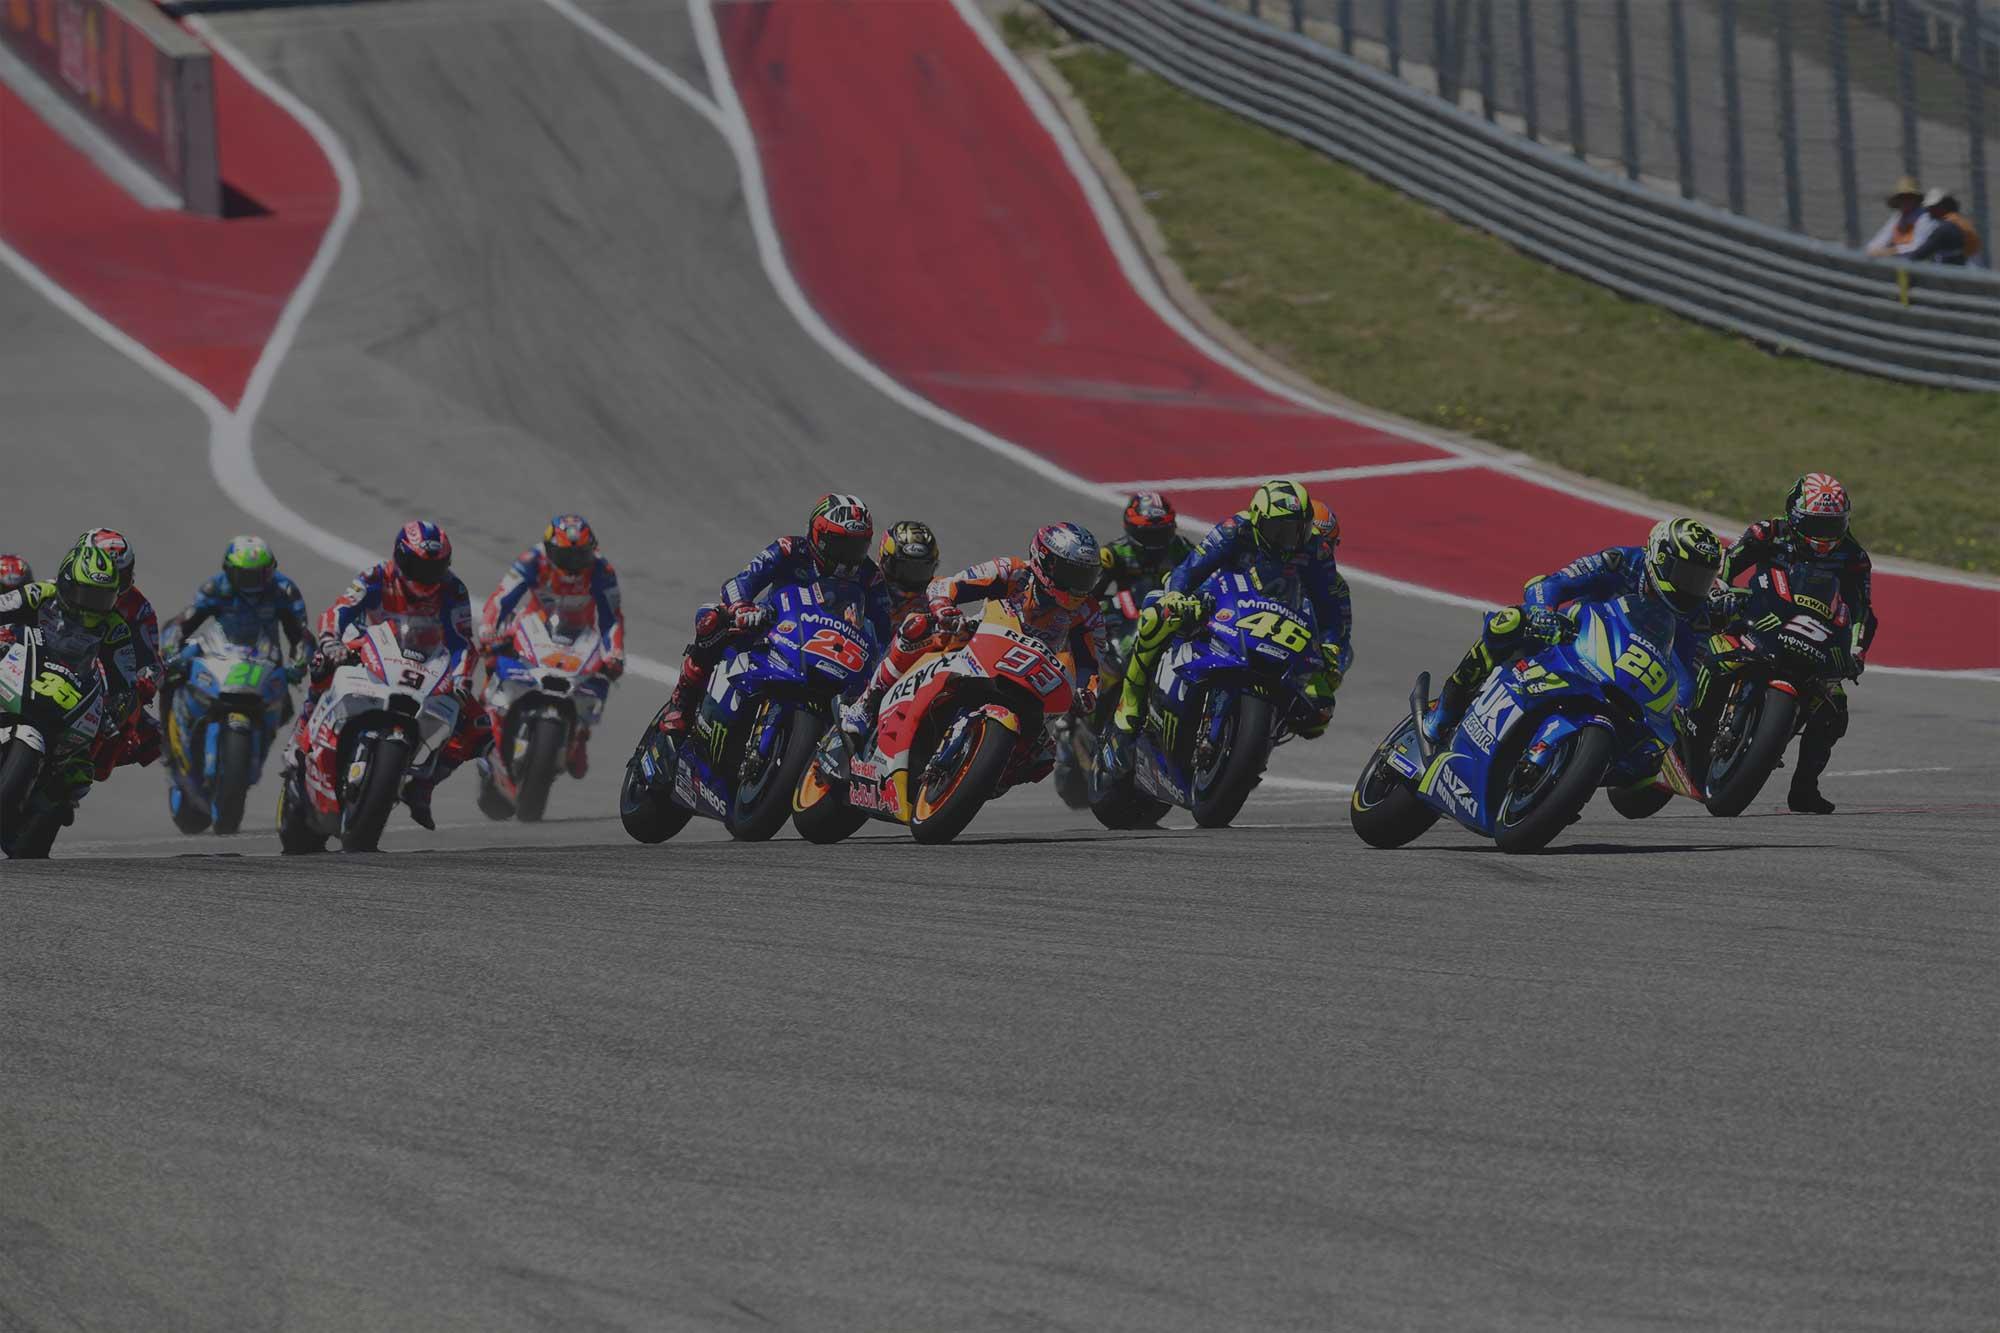 2019 Austin MotoGP Travel Packages